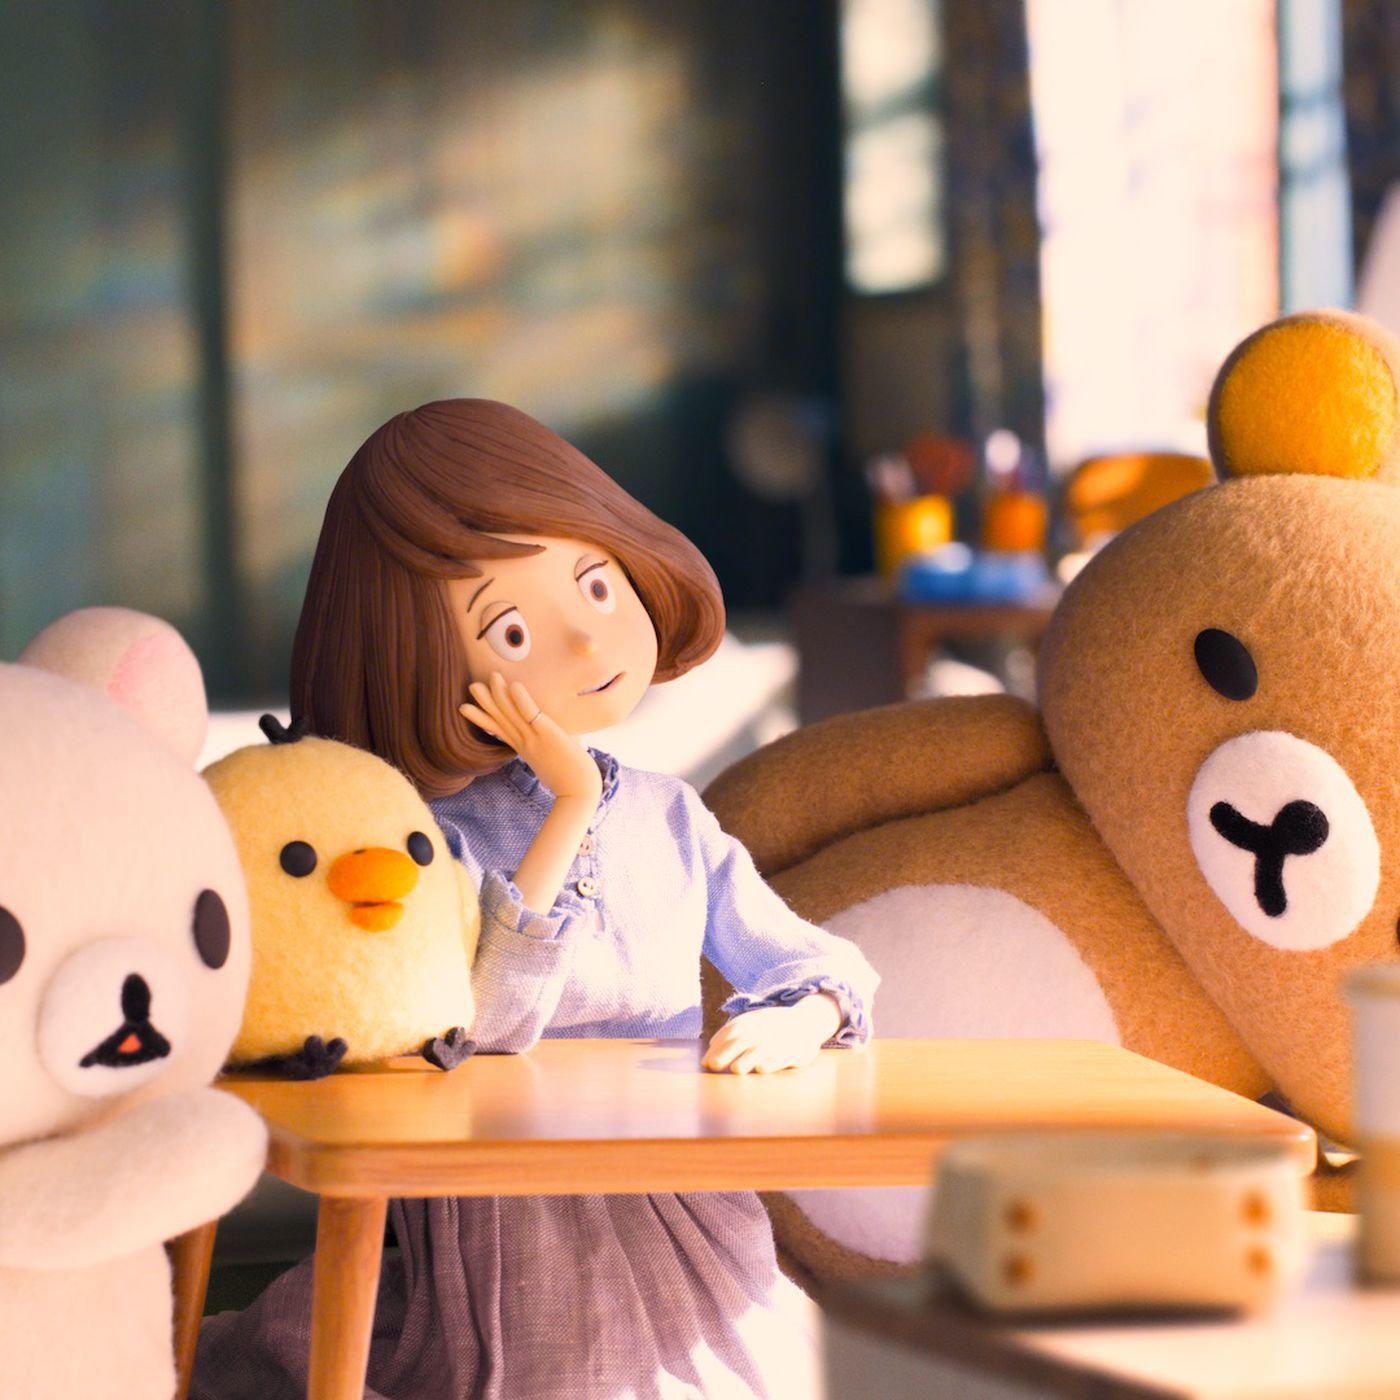 Experience cuteness overload with Netflix's Rilakkuma and